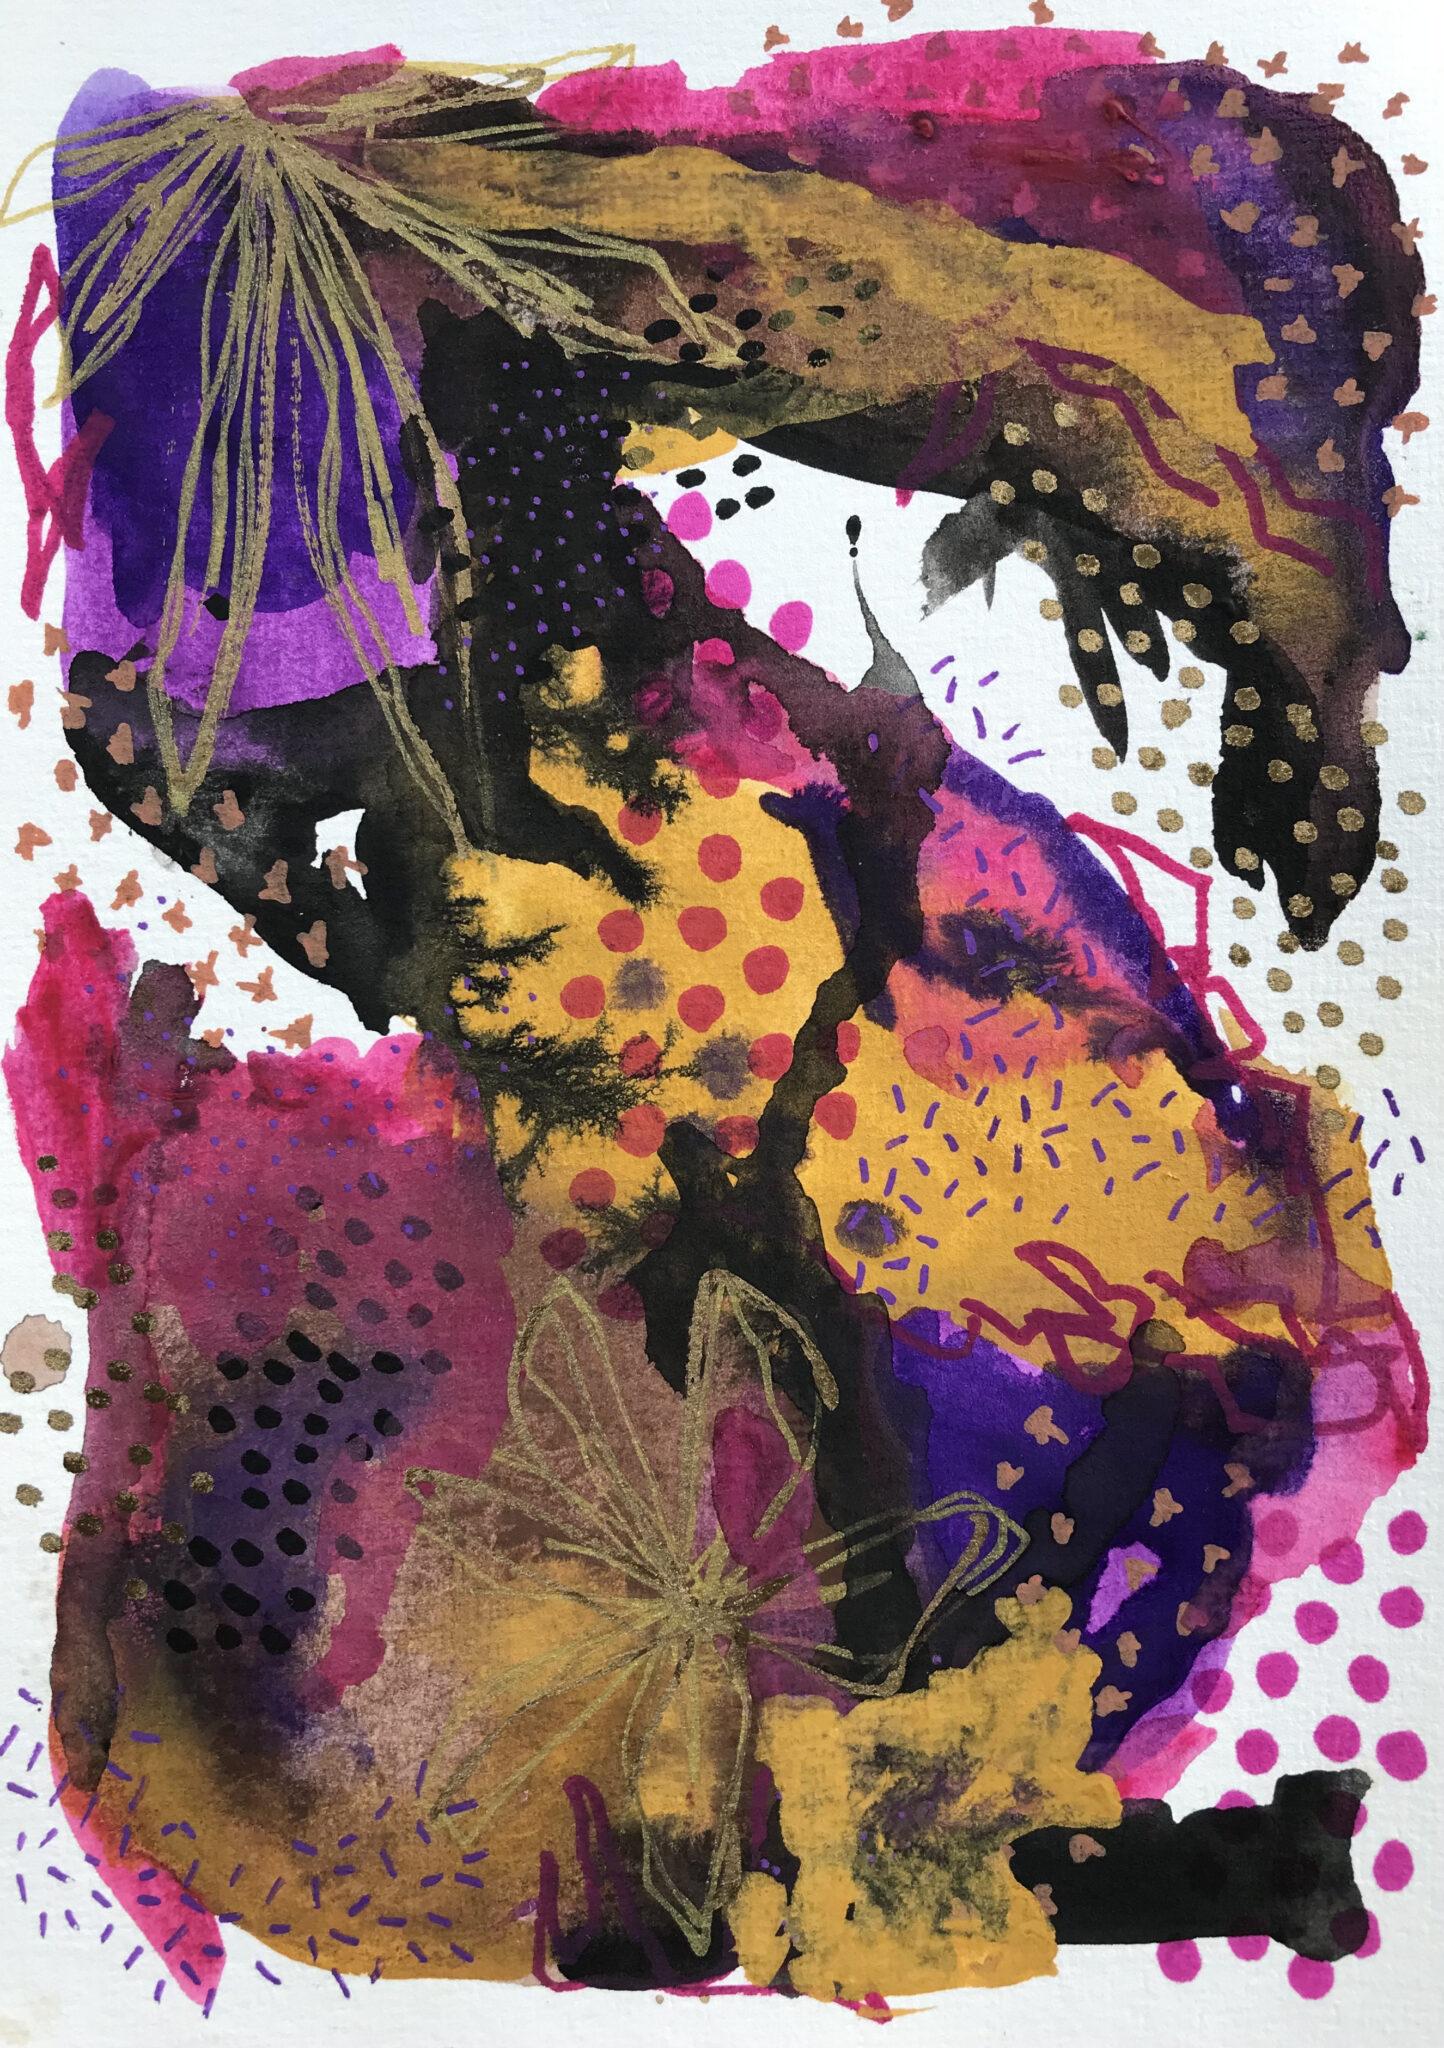 Hot Mess 1 – Mixed Media Original Artwork By Tish Willo Creative